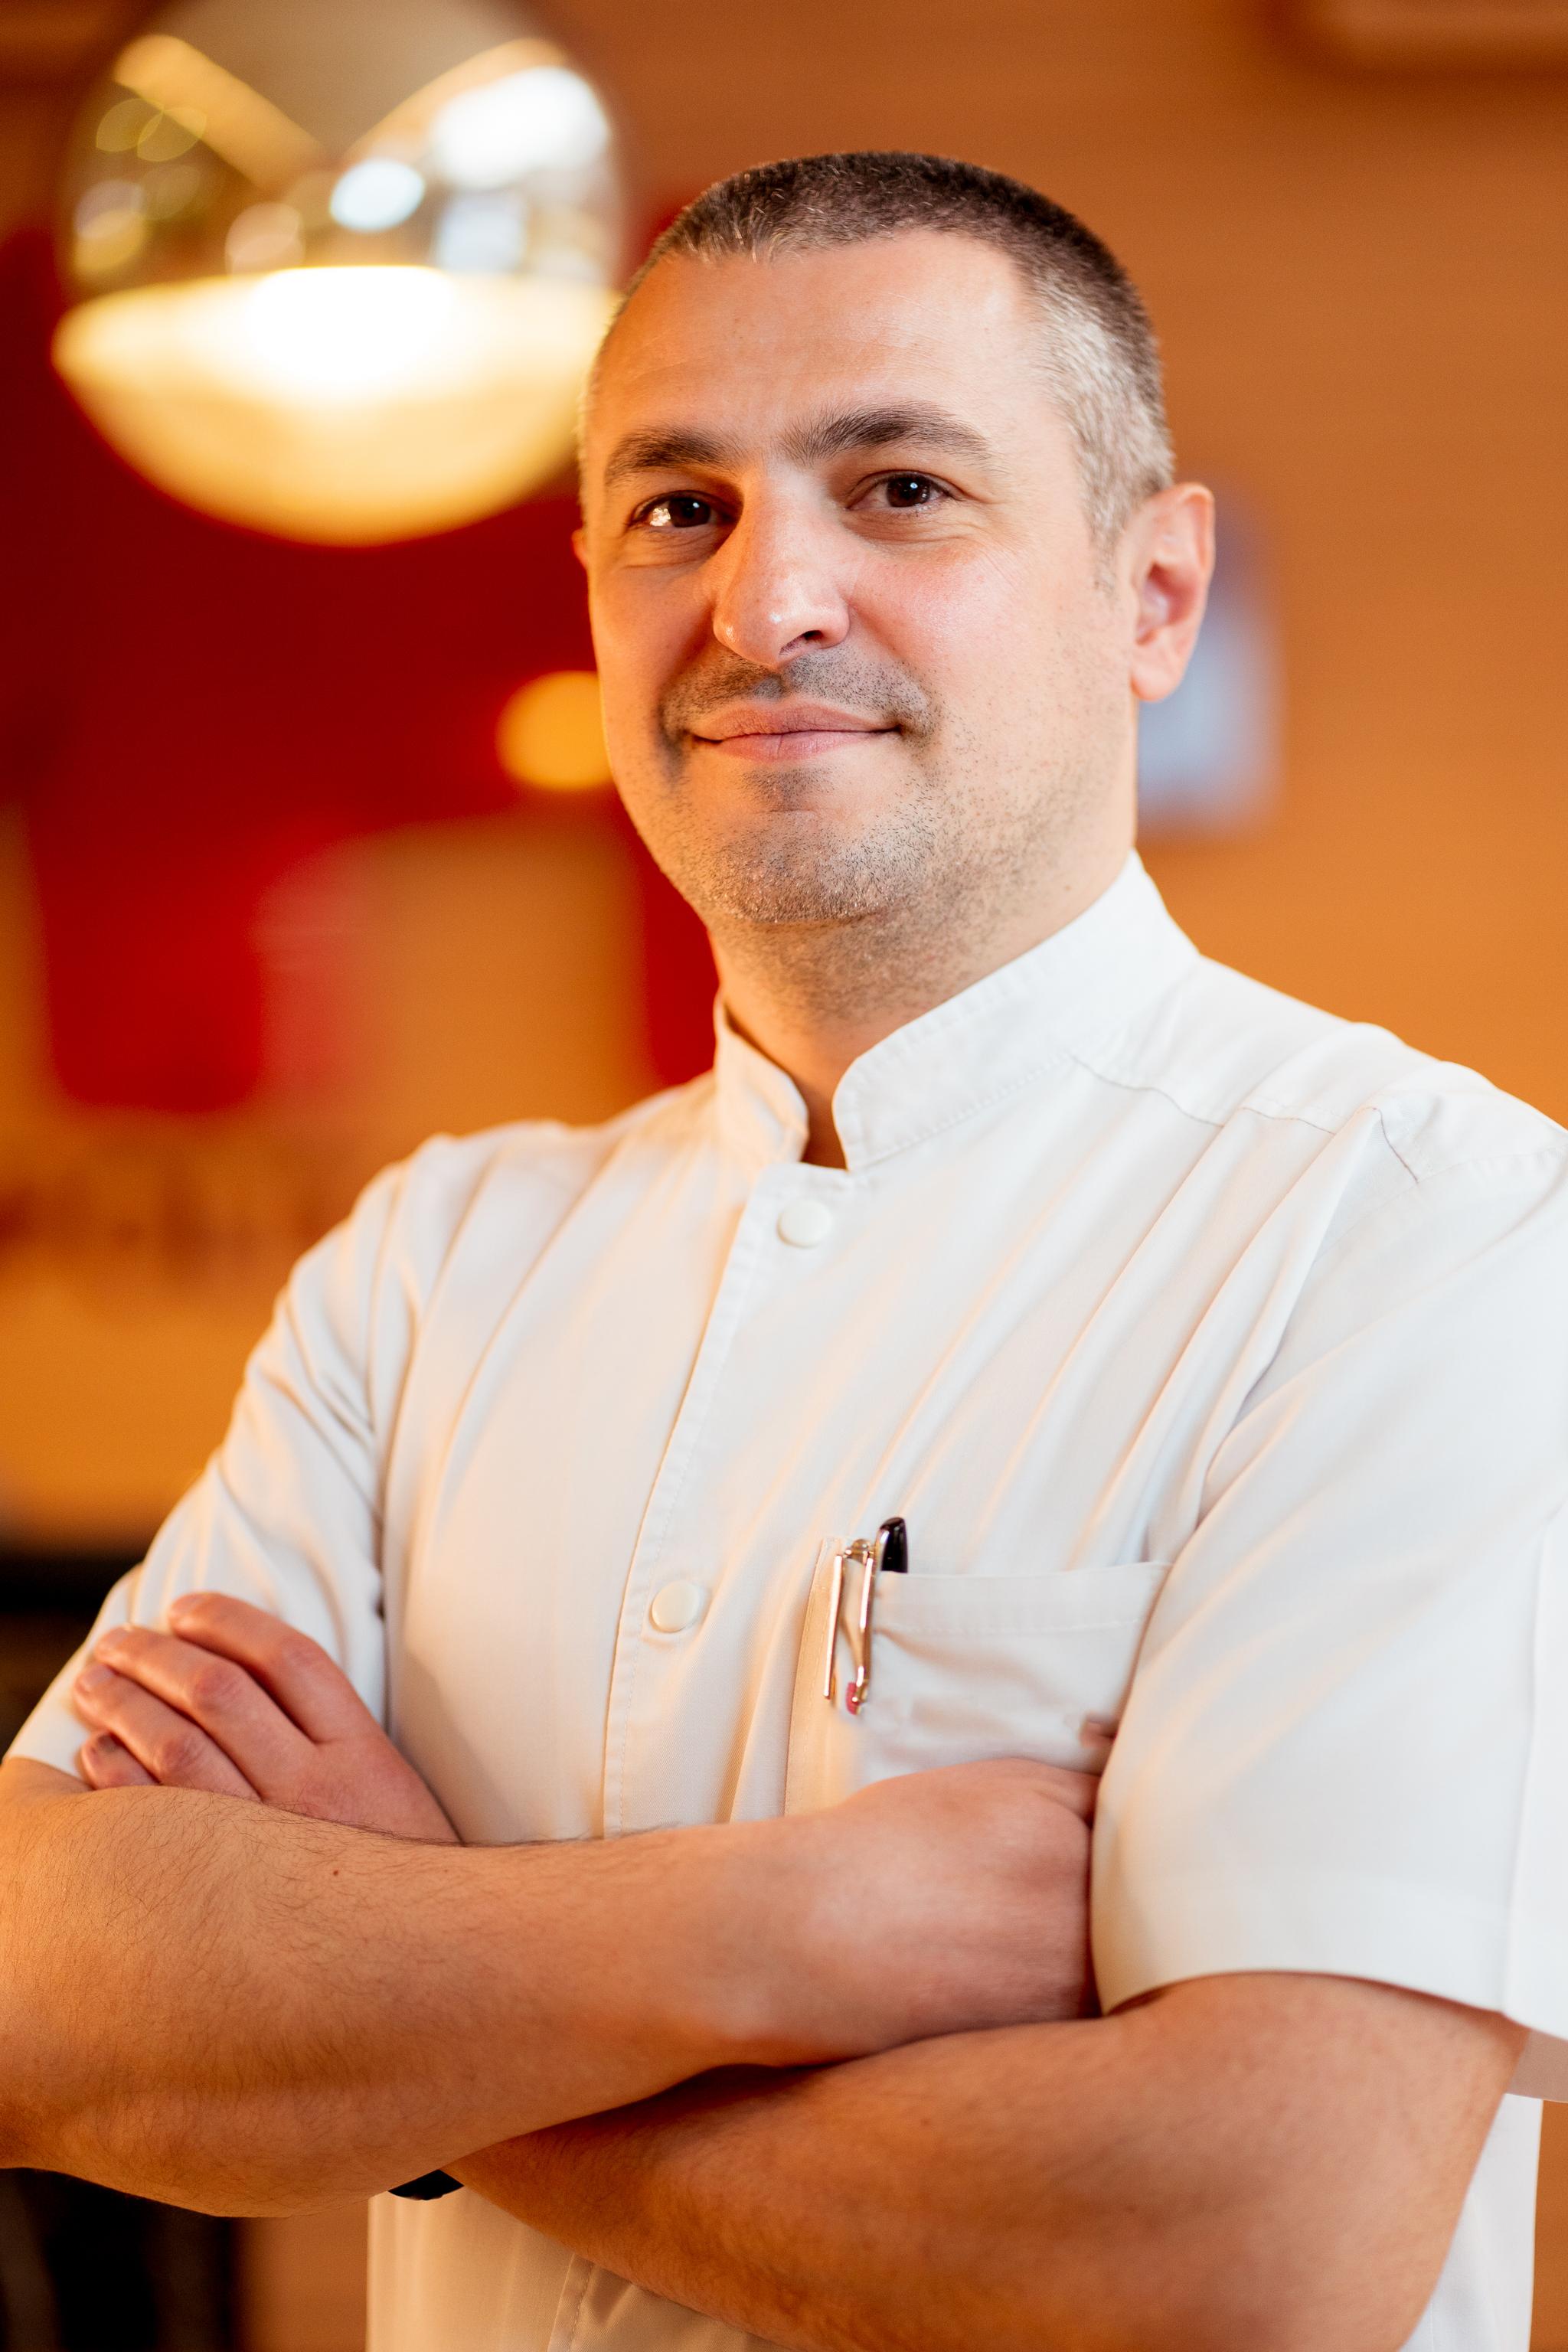 Dr. Daniel Dima